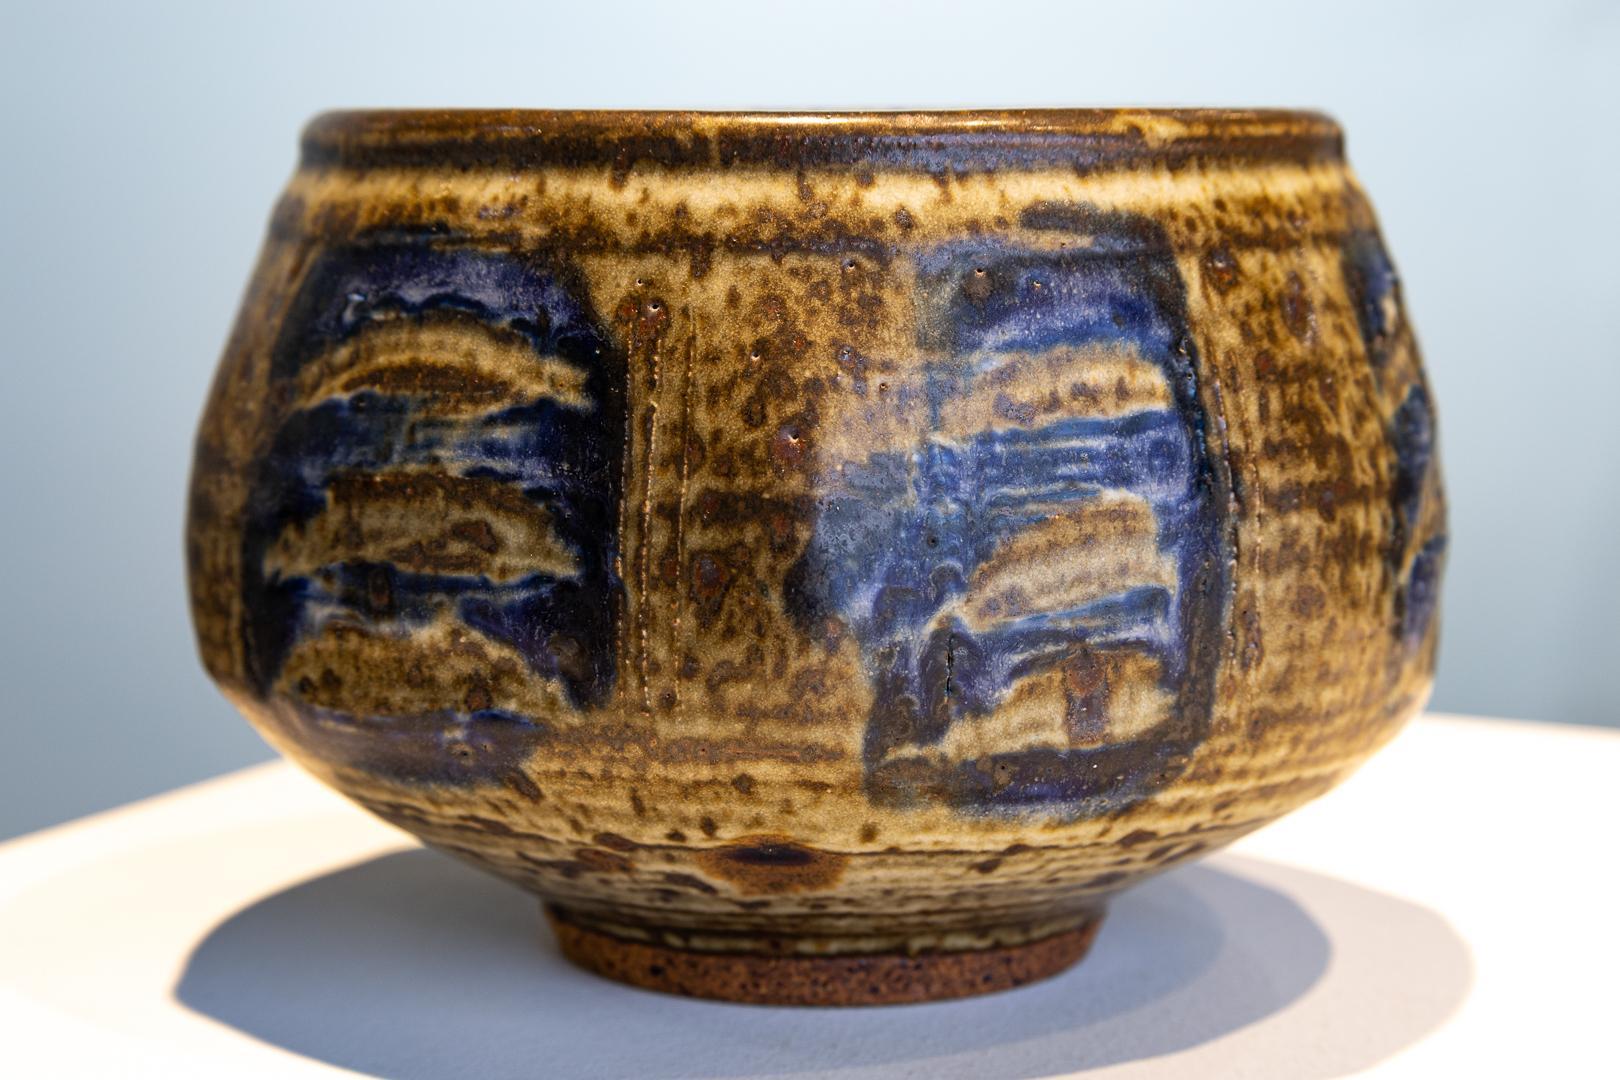 """Salt Glaze Stoneware Ceramic with Blue Design"" Otto & Vivika Heino Ceramic Bowl"